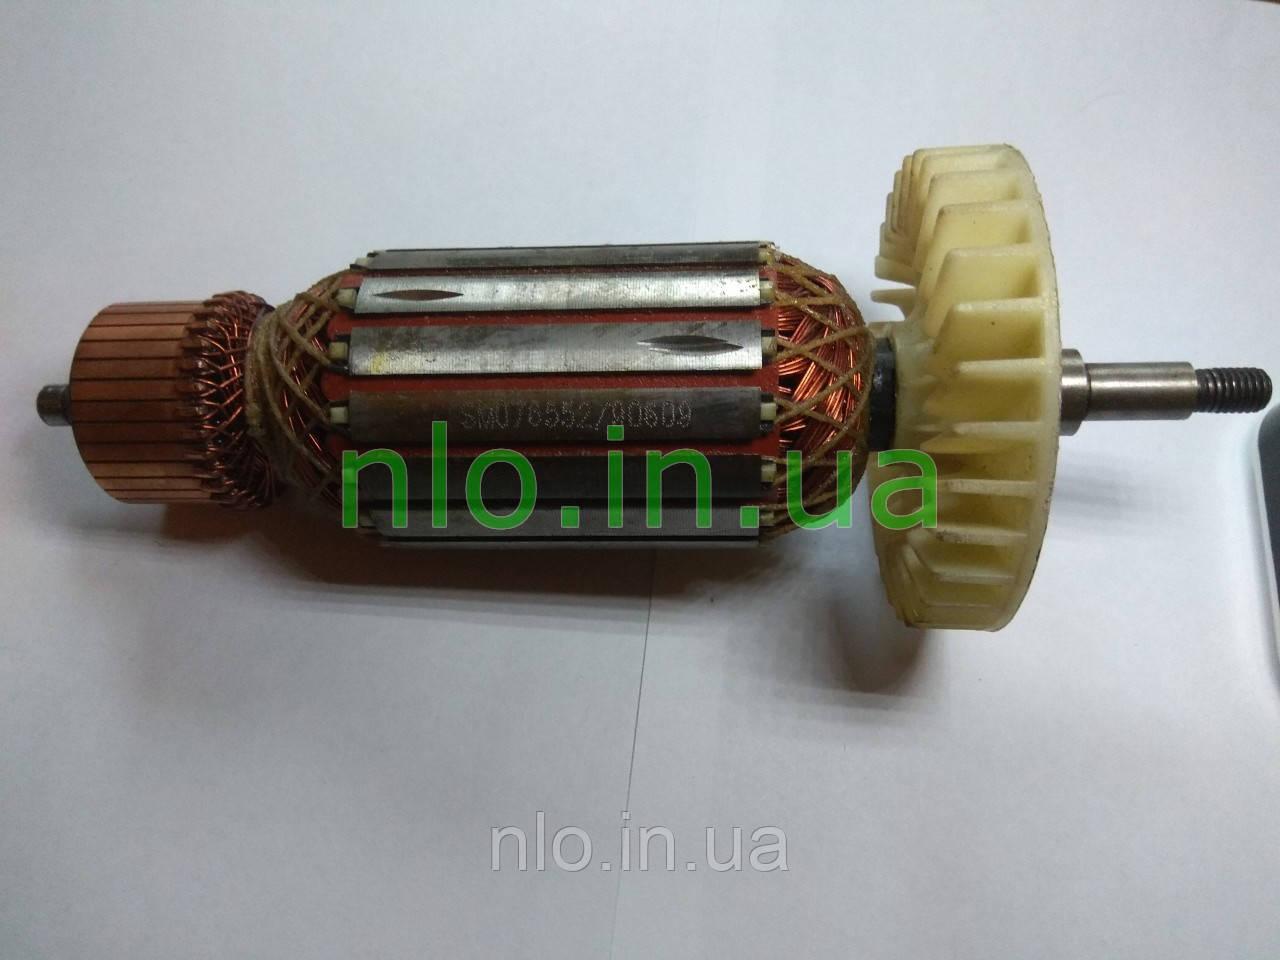 Якір болгарки MU 2301 (218х54 10 мм)